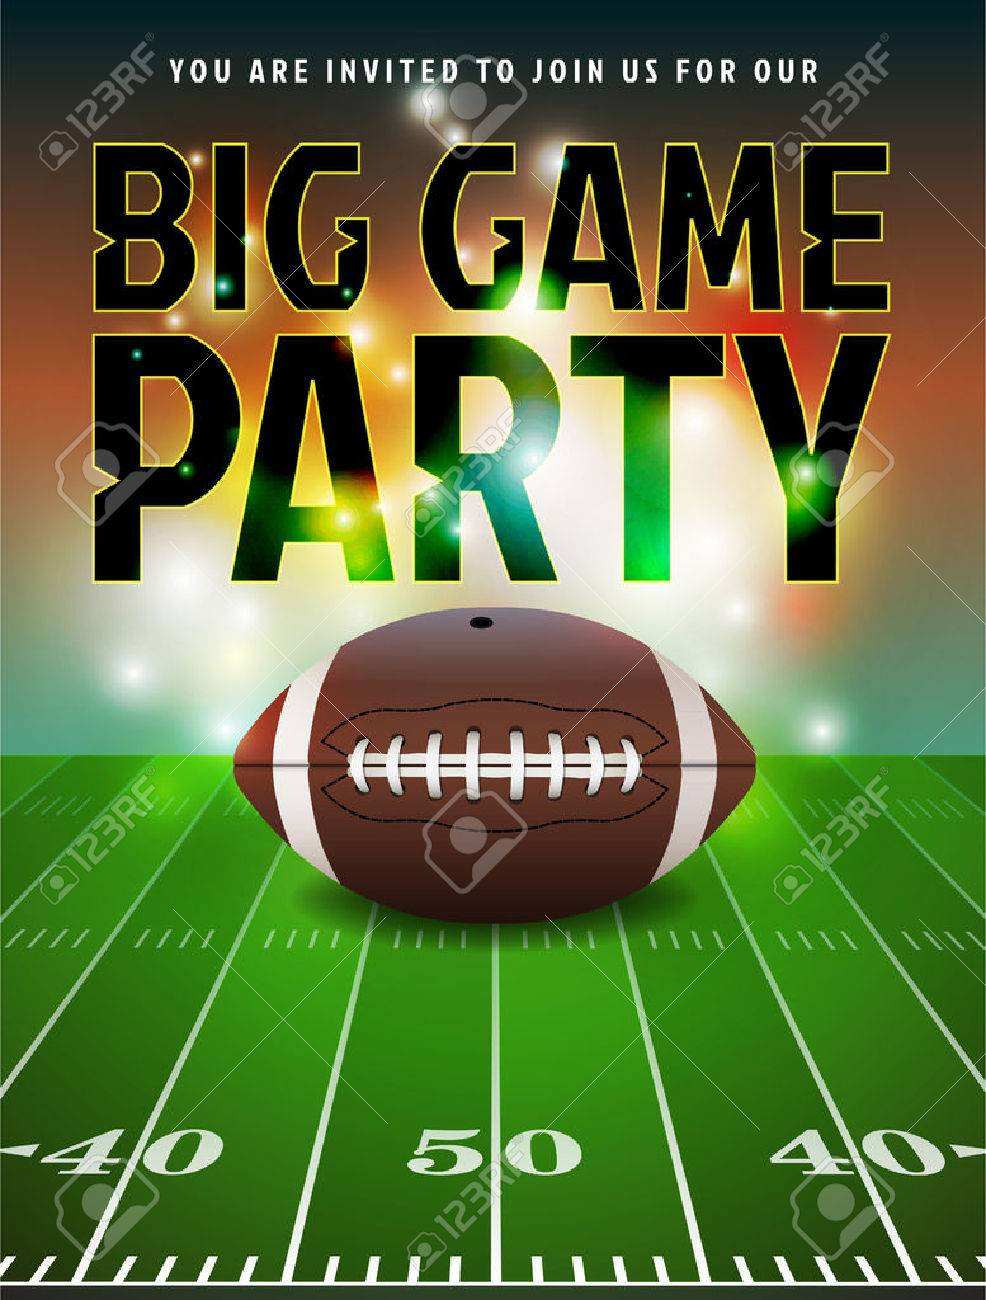 American football party invitation illustration.= - 51394592